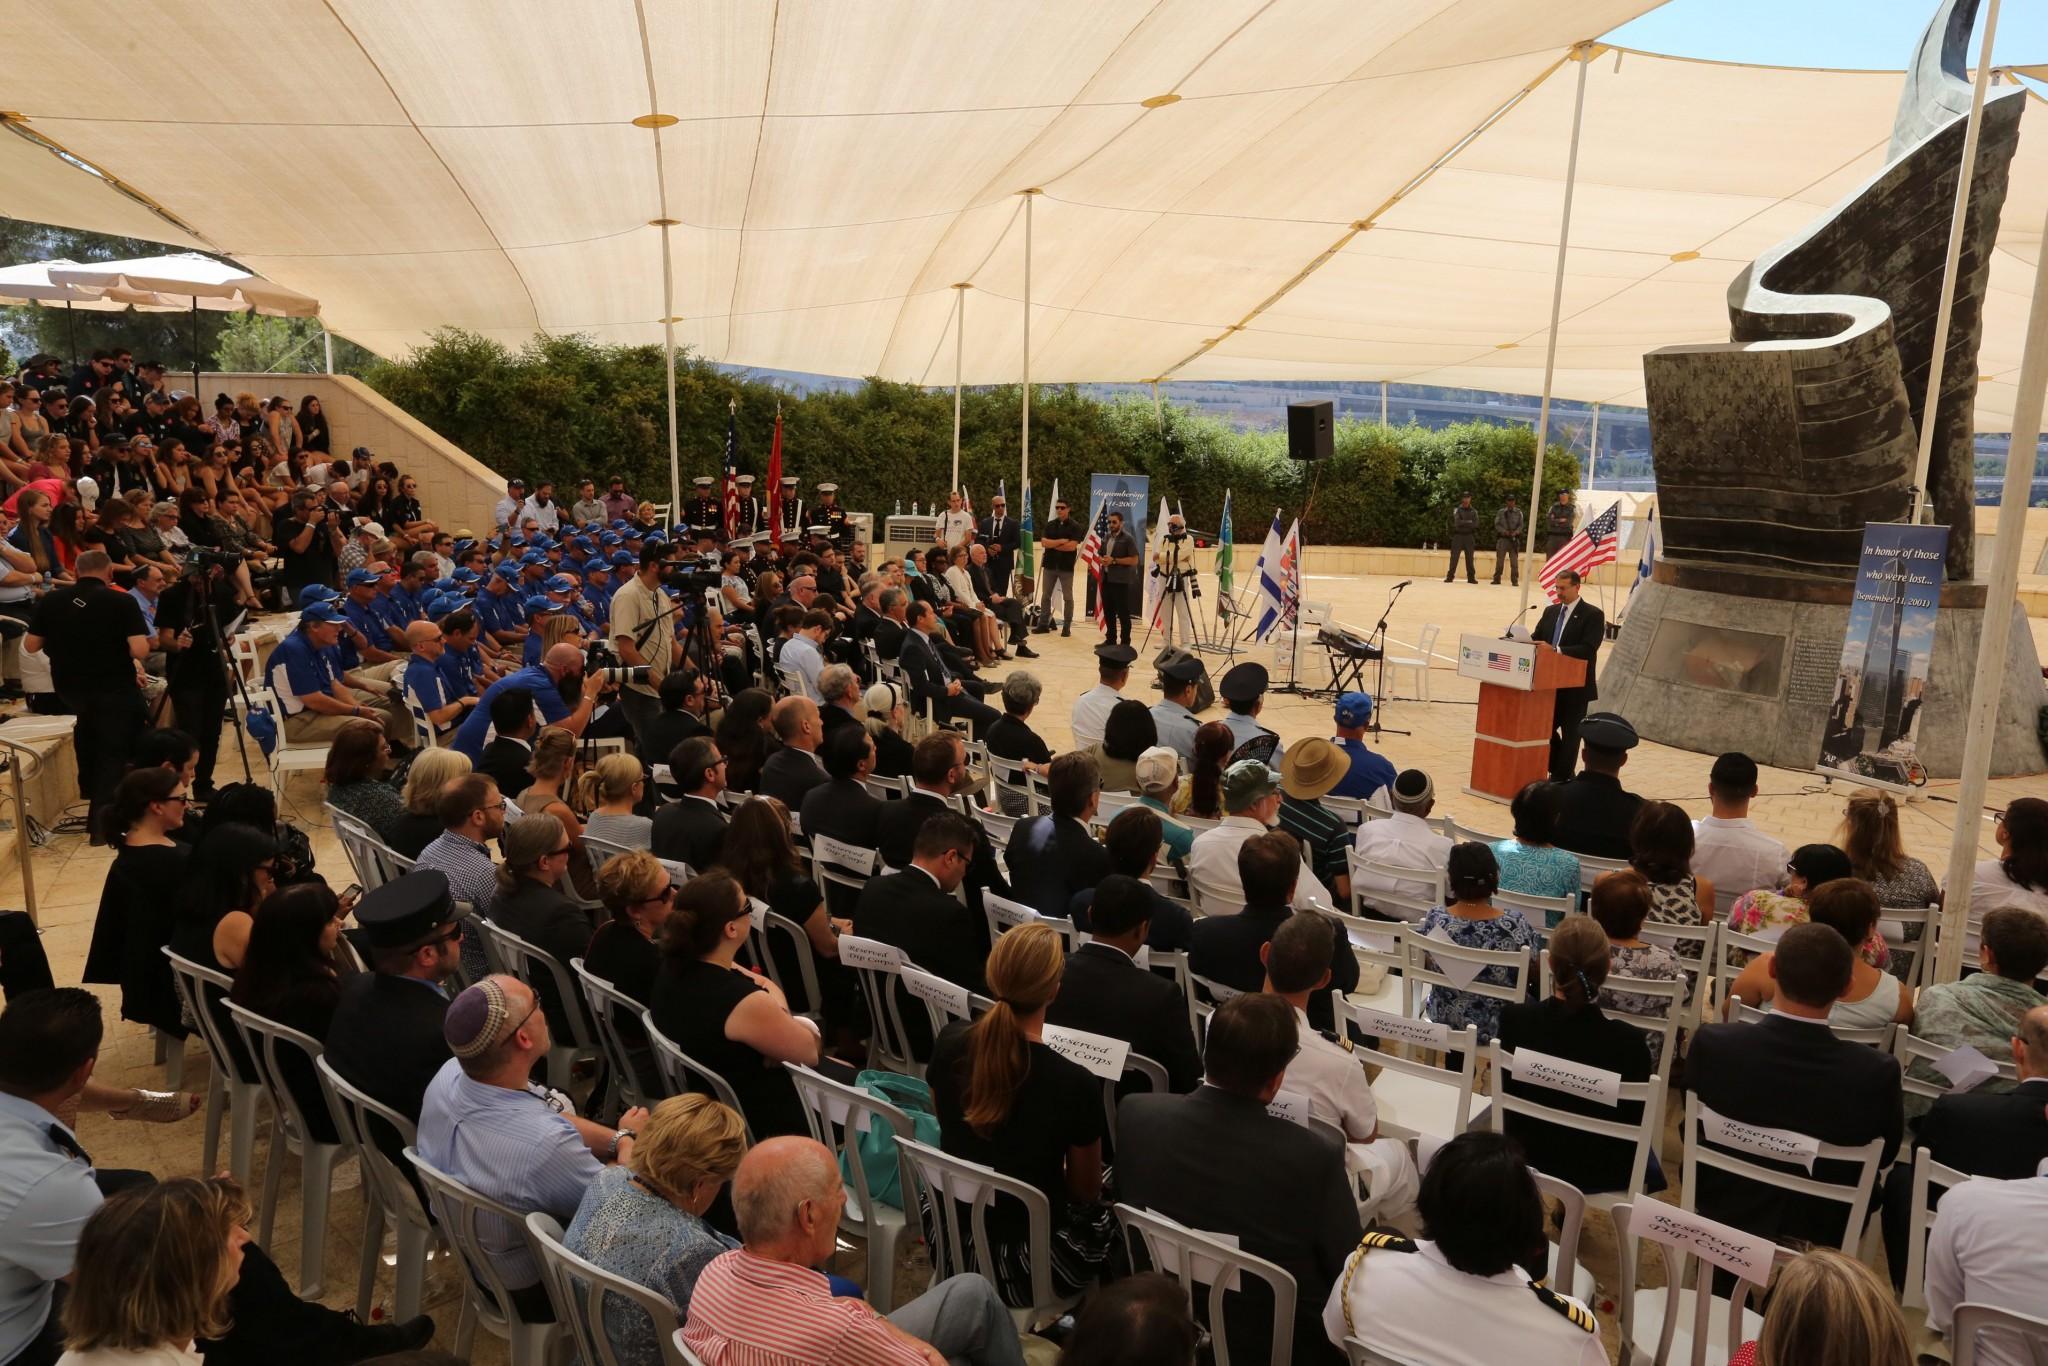 KKL/JNF Living Memorial ceremony, September 11, 2016. Photo by Yossi Zamir/ KKL-JNF